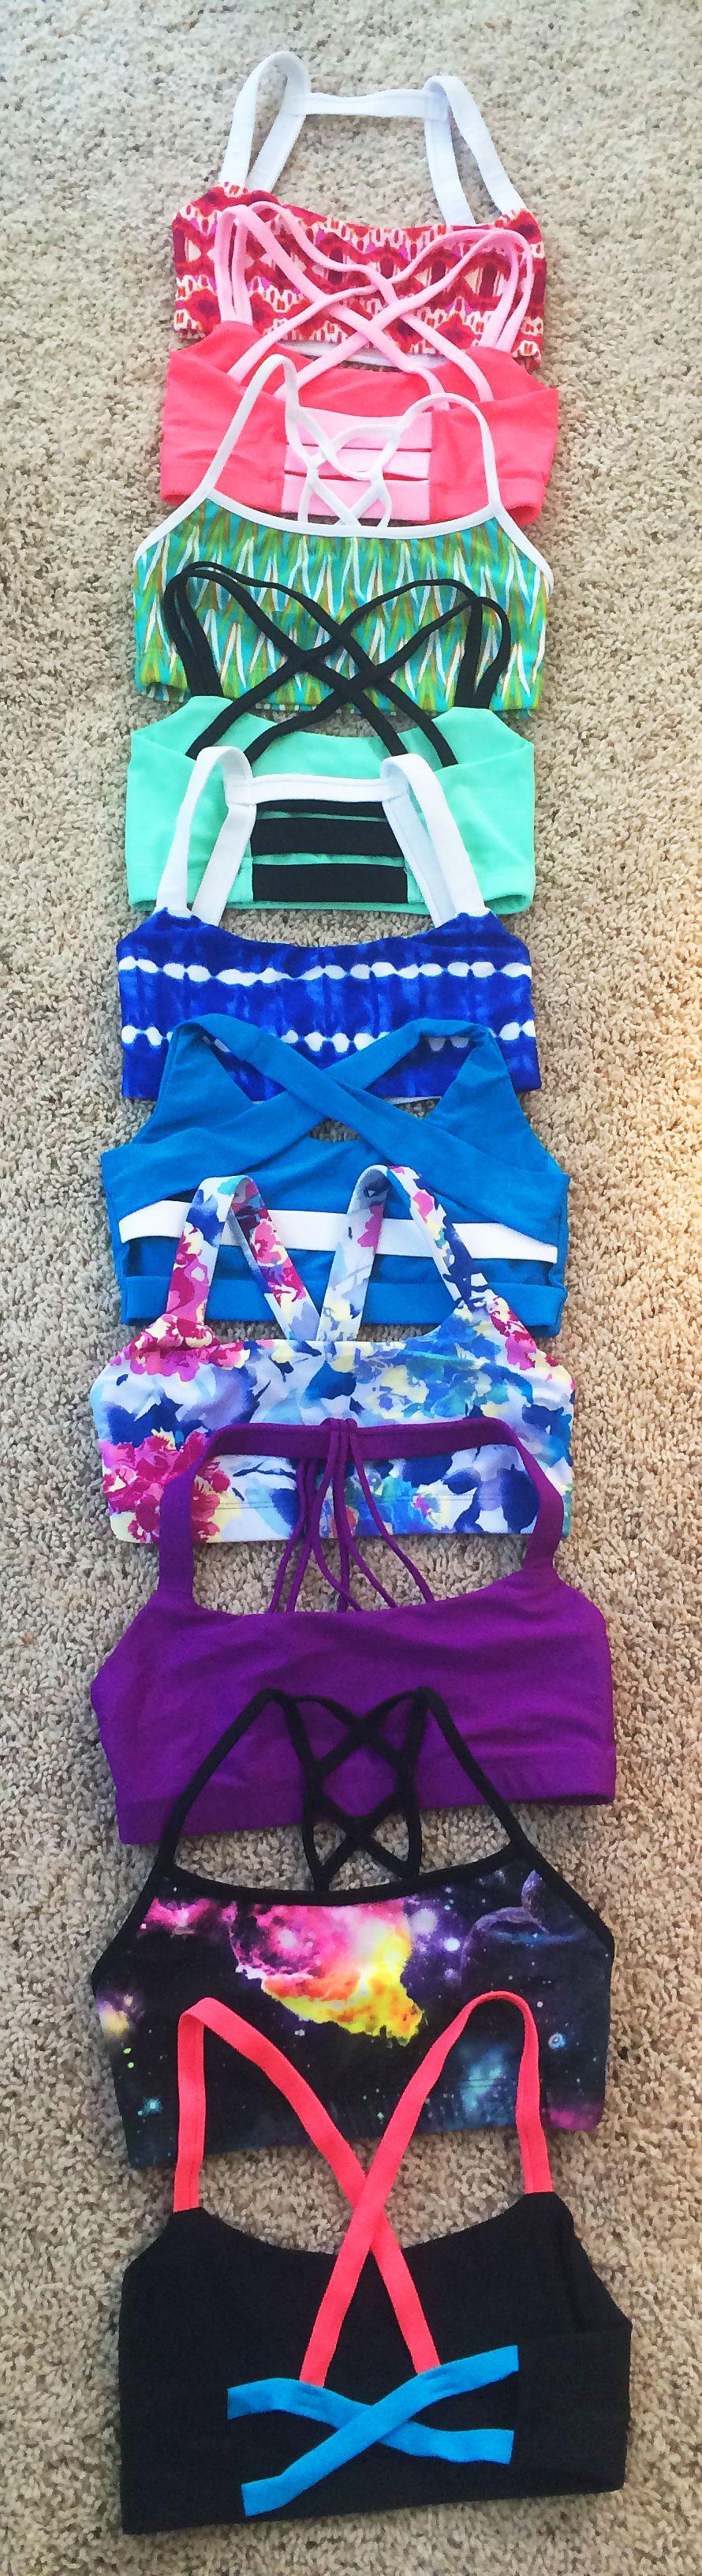 367b8541015 So many cute sports bras